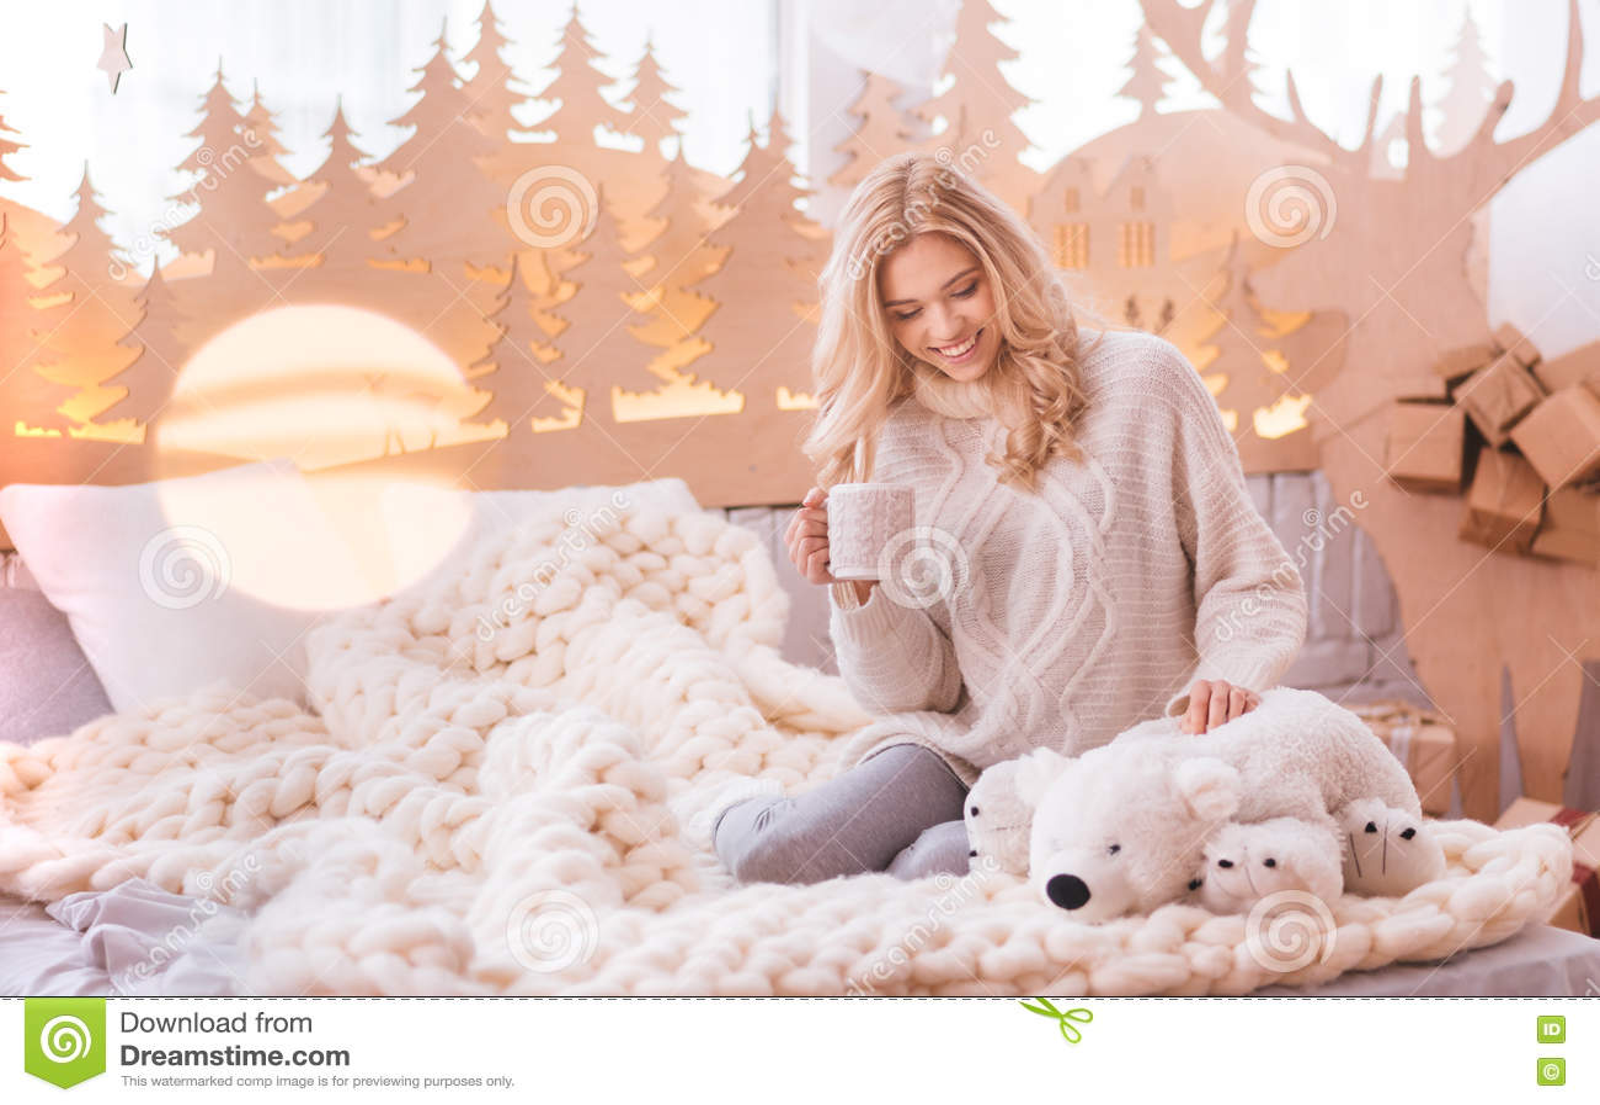 Download Attractive Pleasant Woman Having Tea Stock Image - Image of beautiful, celebration: 82041519